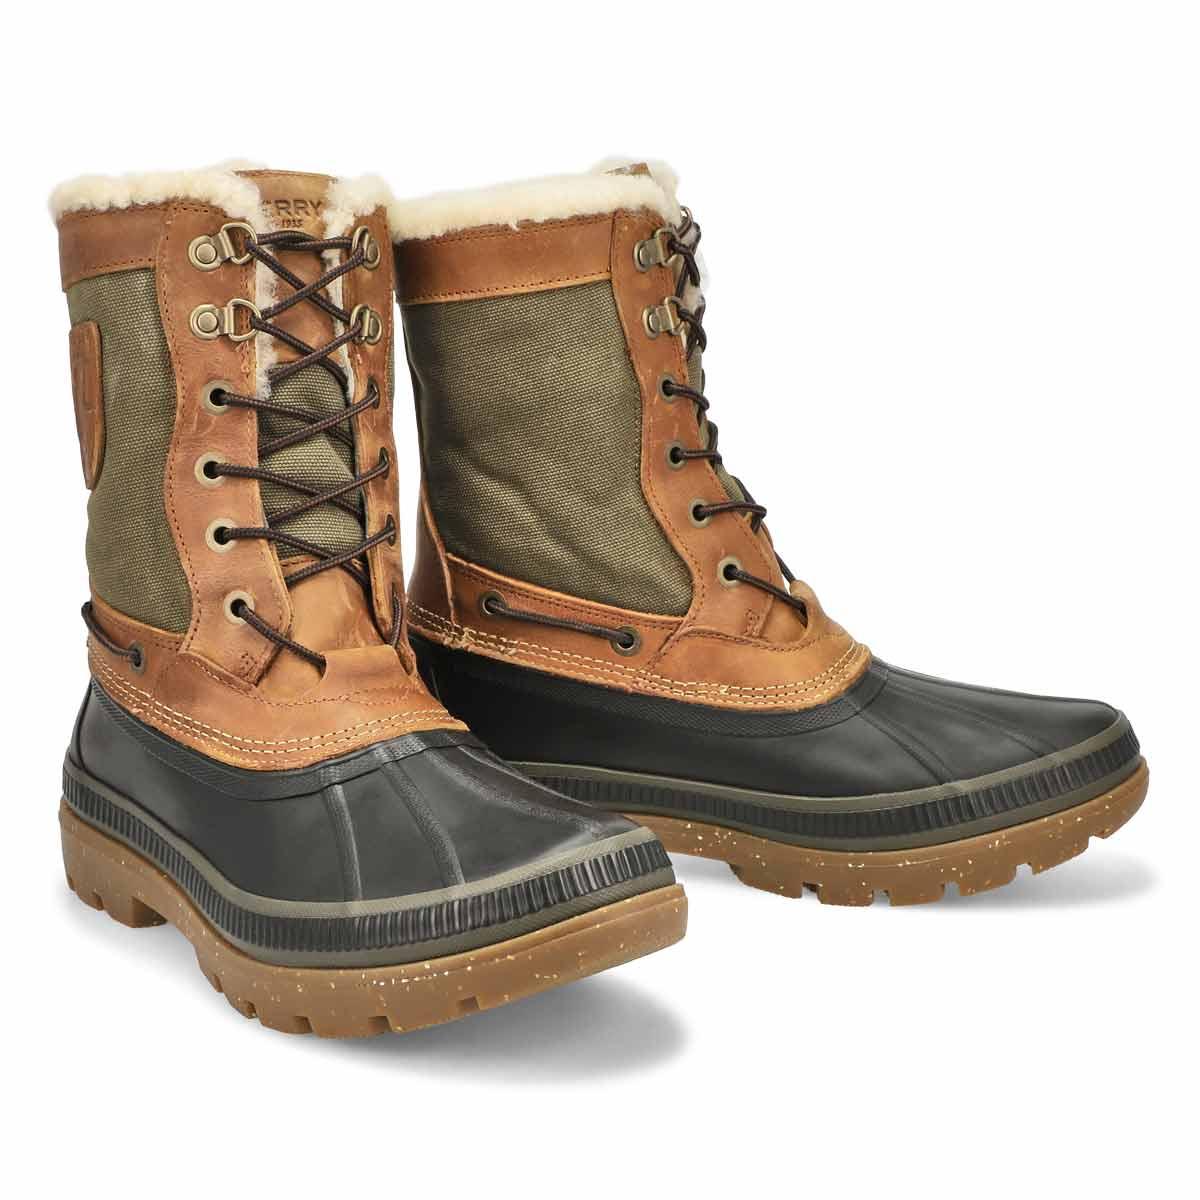 Mns IceBay Tall Boot brn/olv winter boot